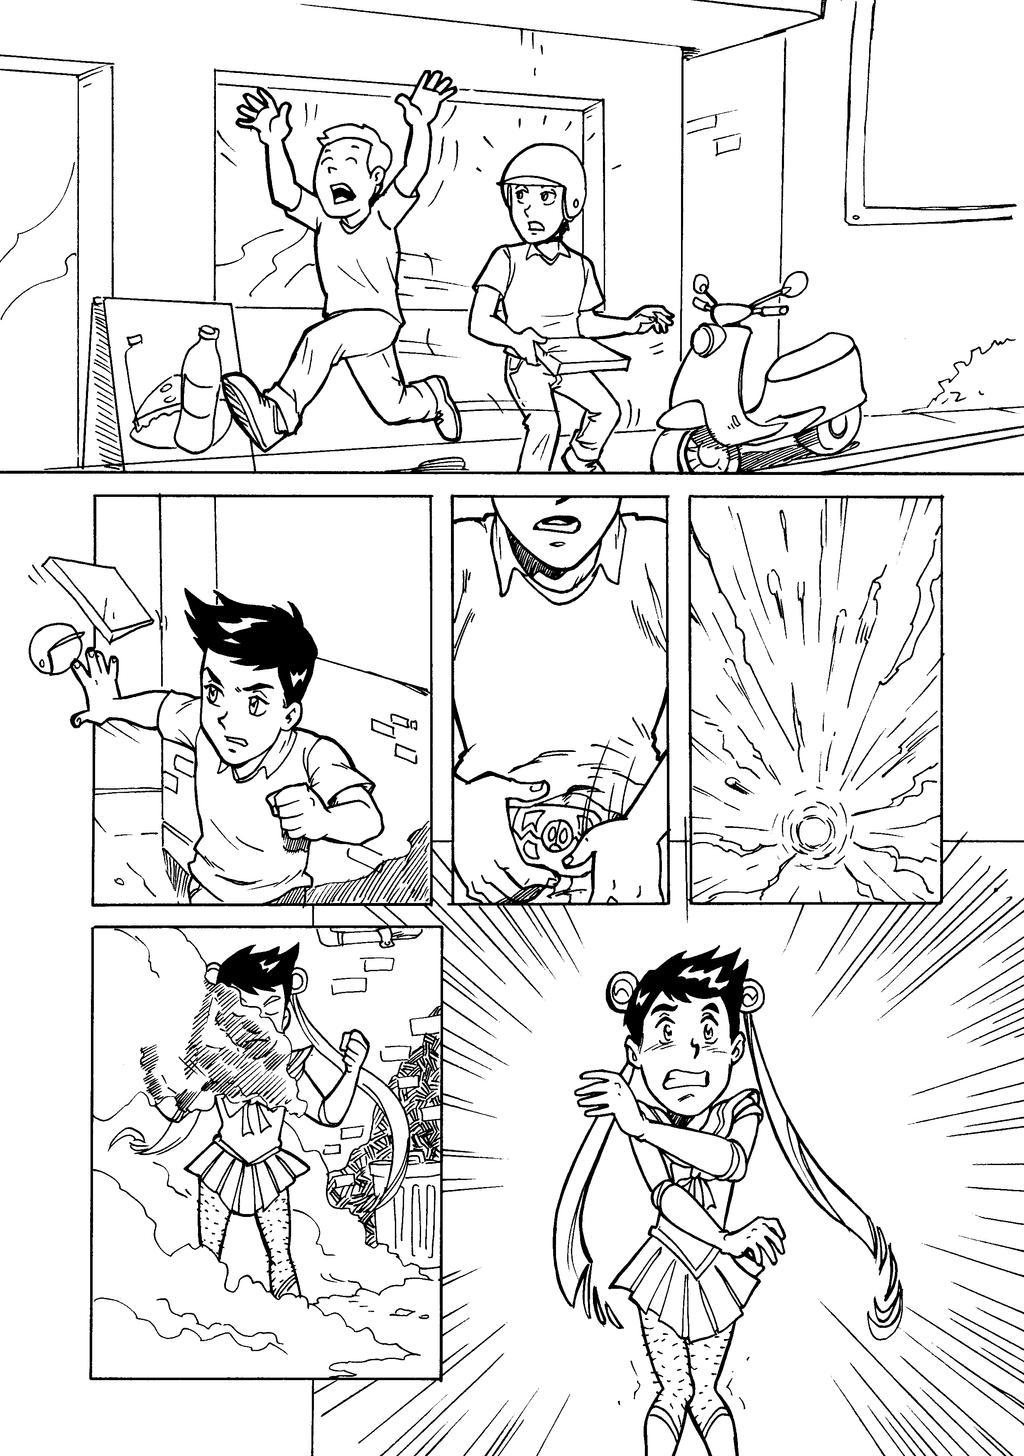 pagina 03 crider Alexandre Coelho by LexSeifer